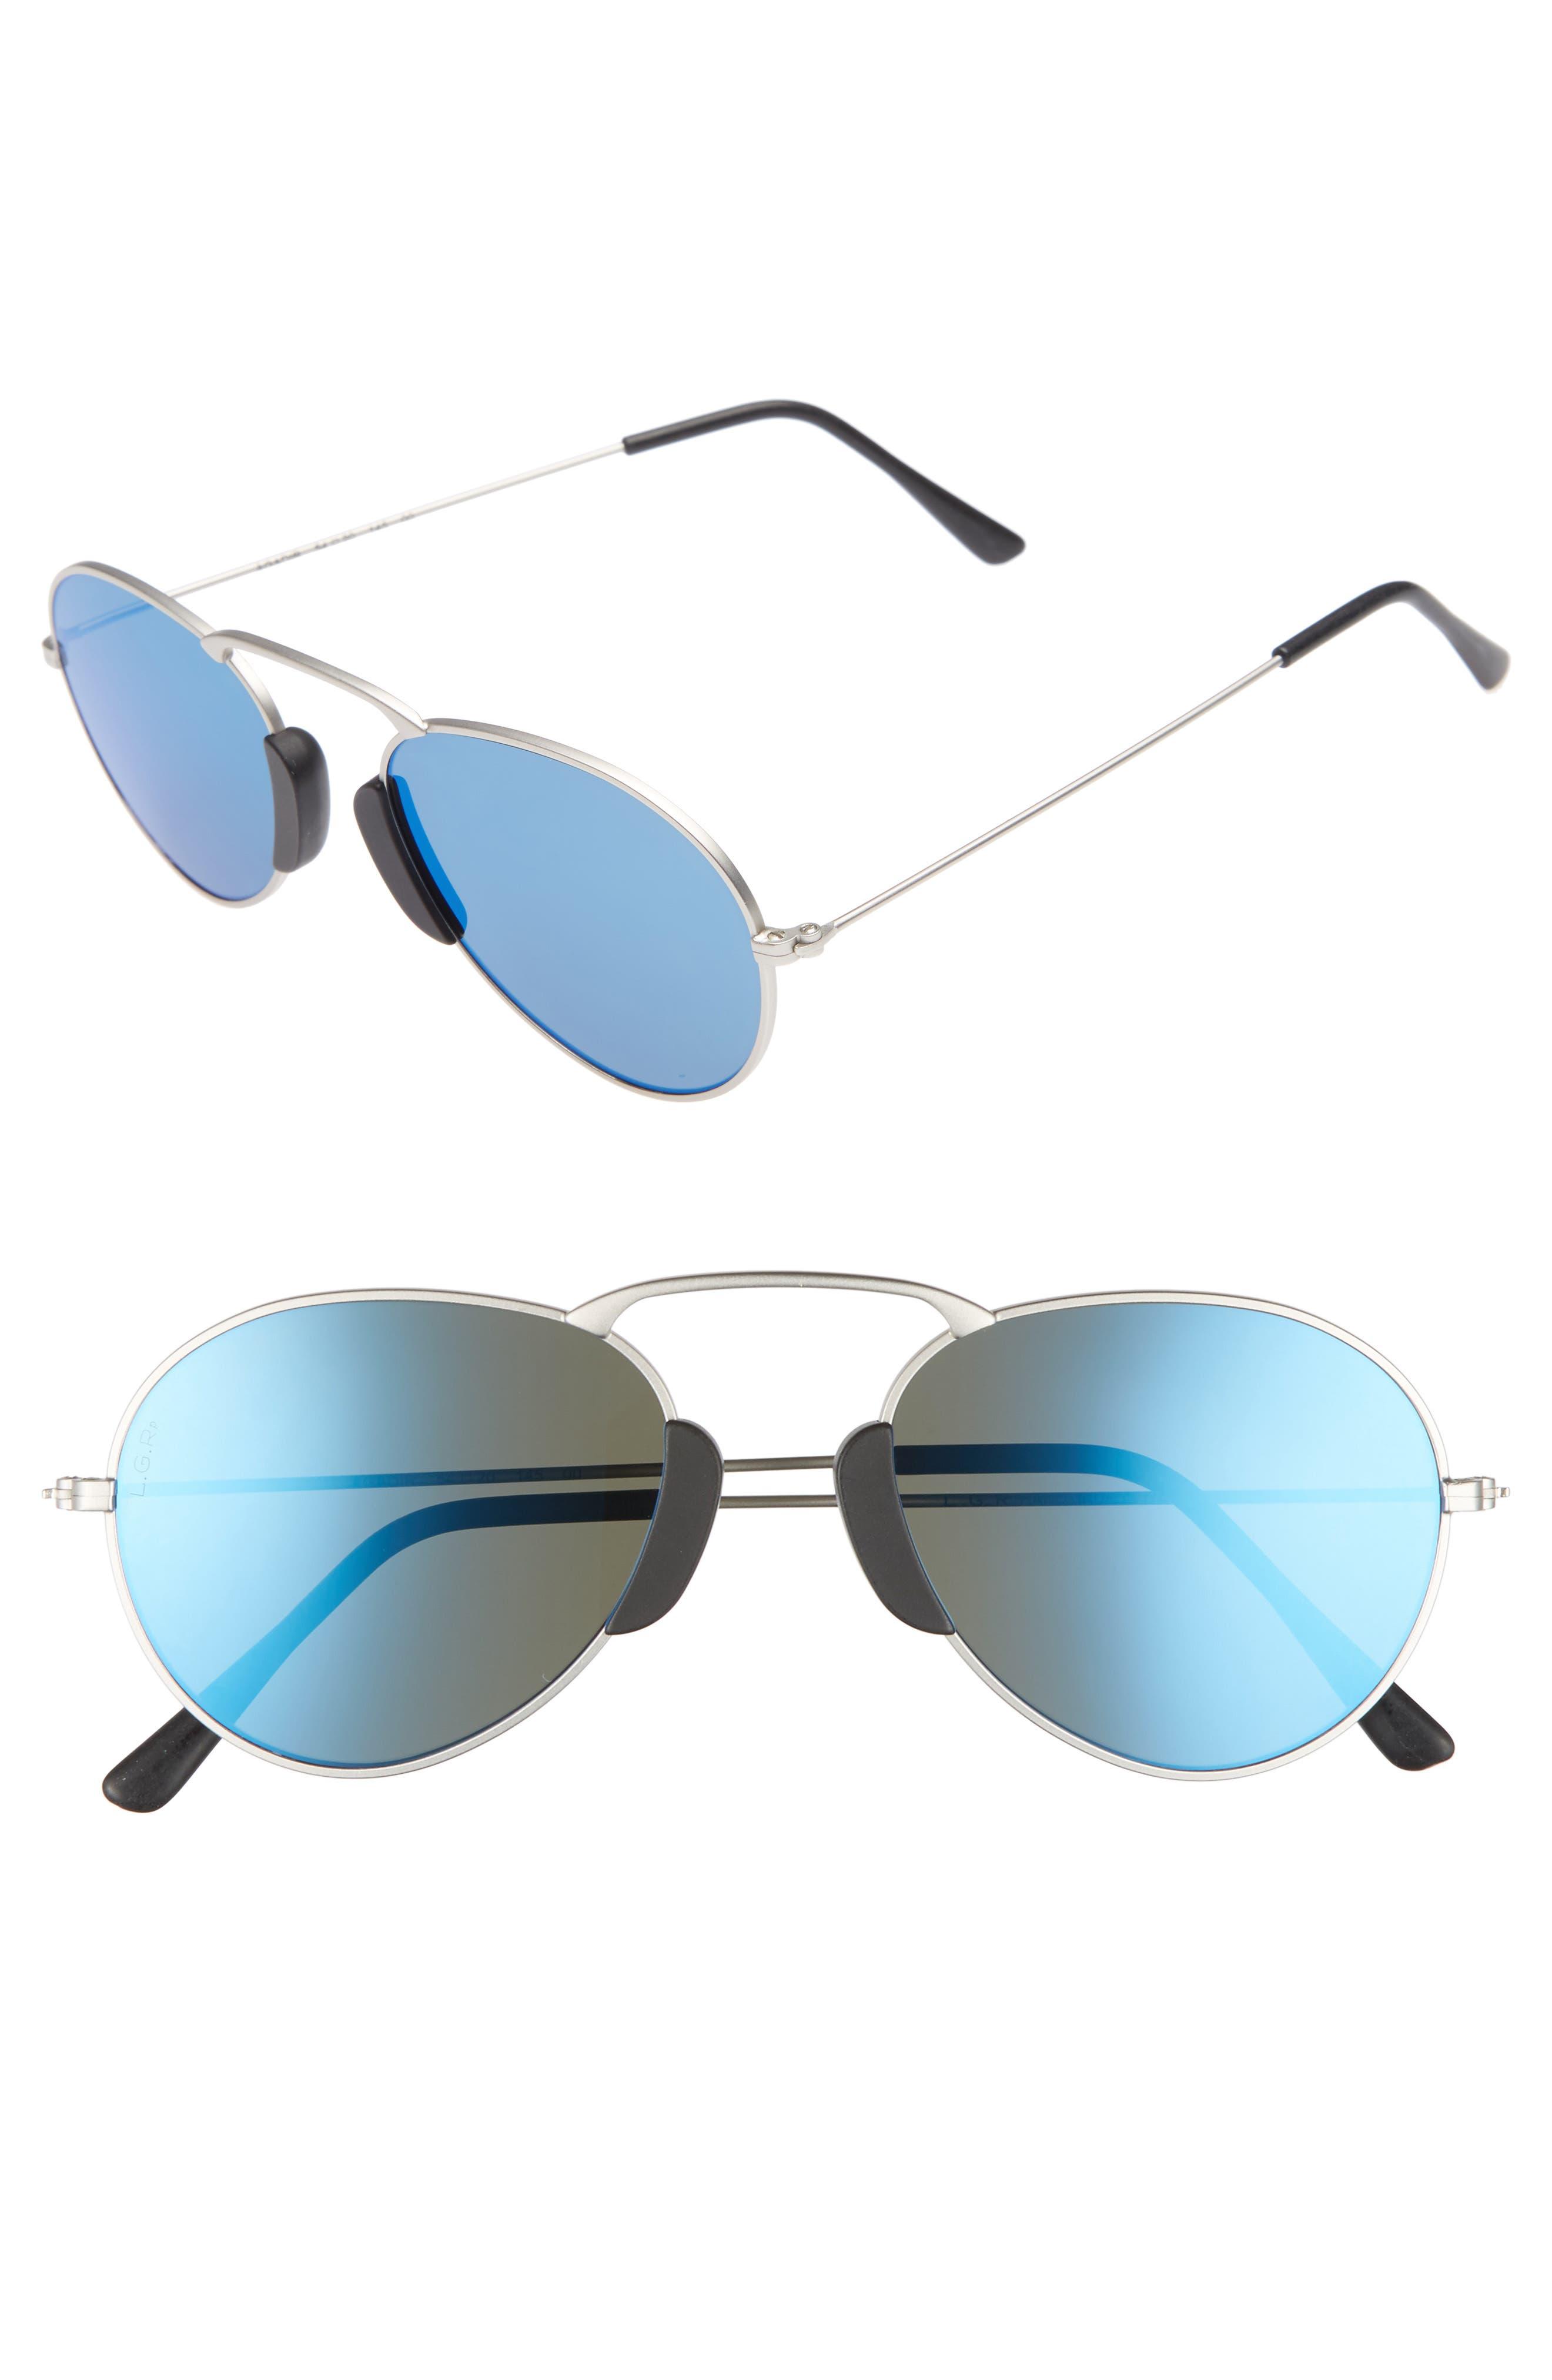 Main Image - L.G.R Agadir 54mm Polarized Sunglasses